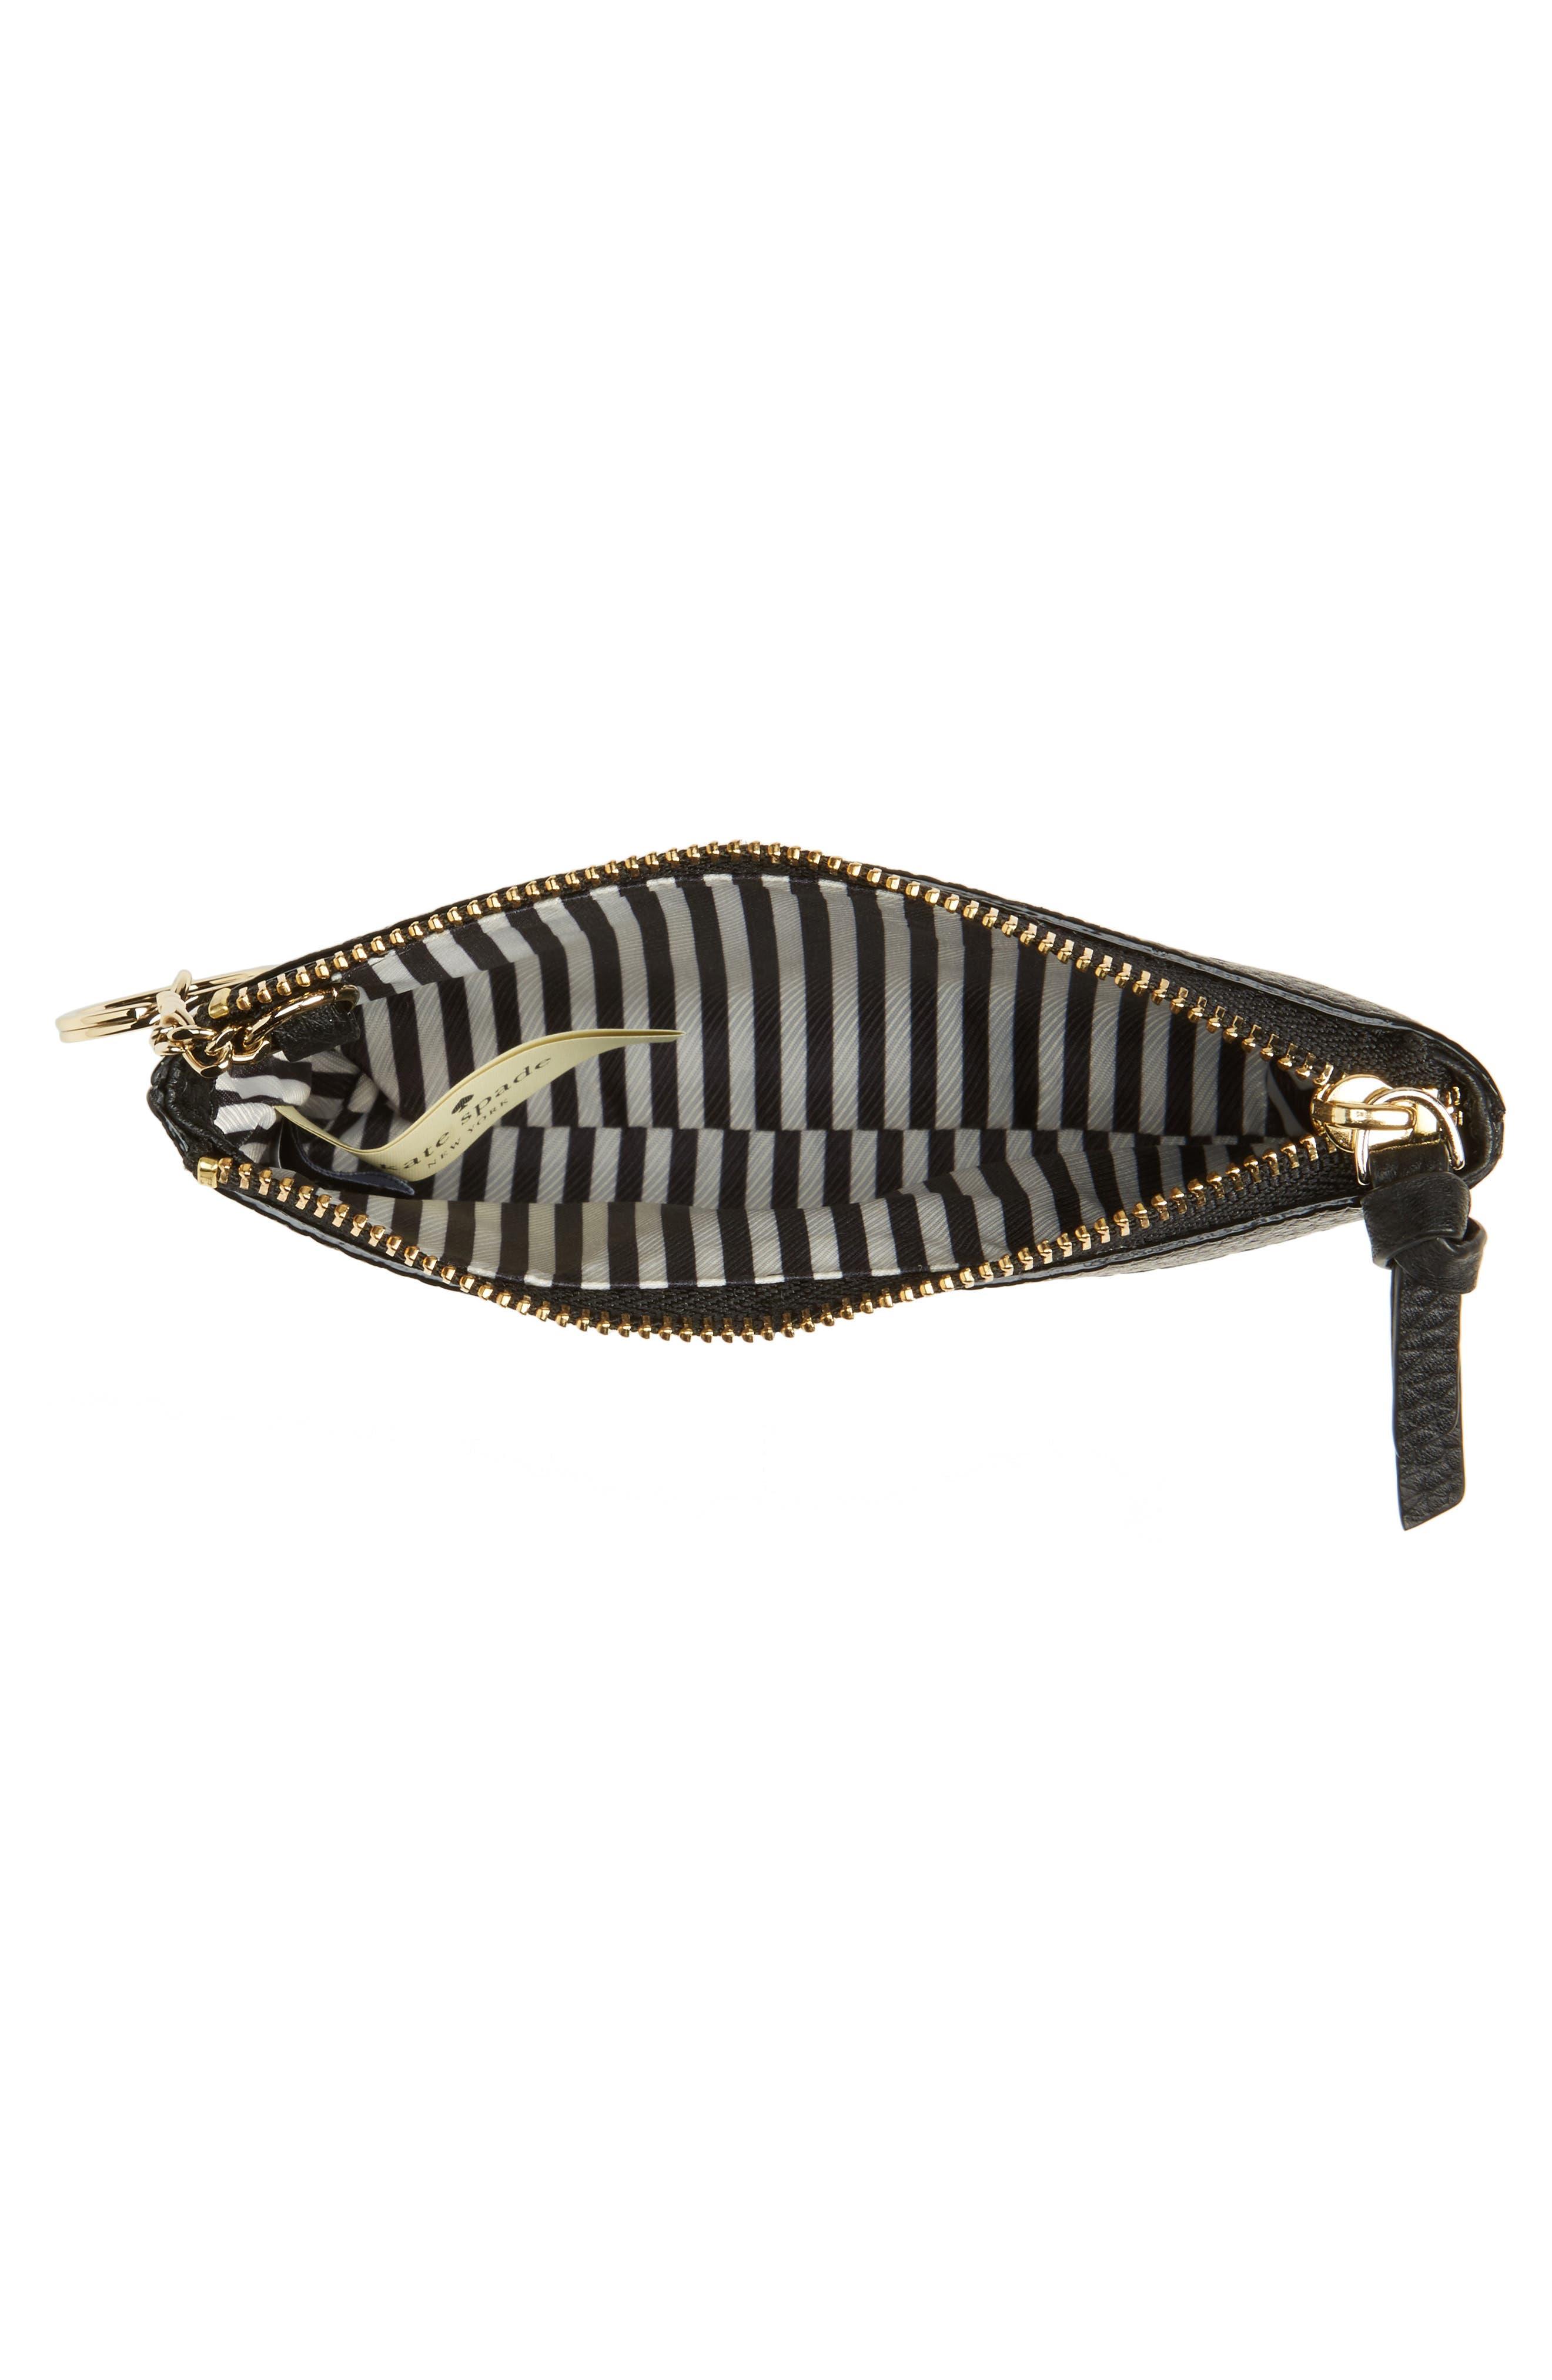 jackson street mila leather zip pouch,                             Alternate thumbnail 2, color,                             Black